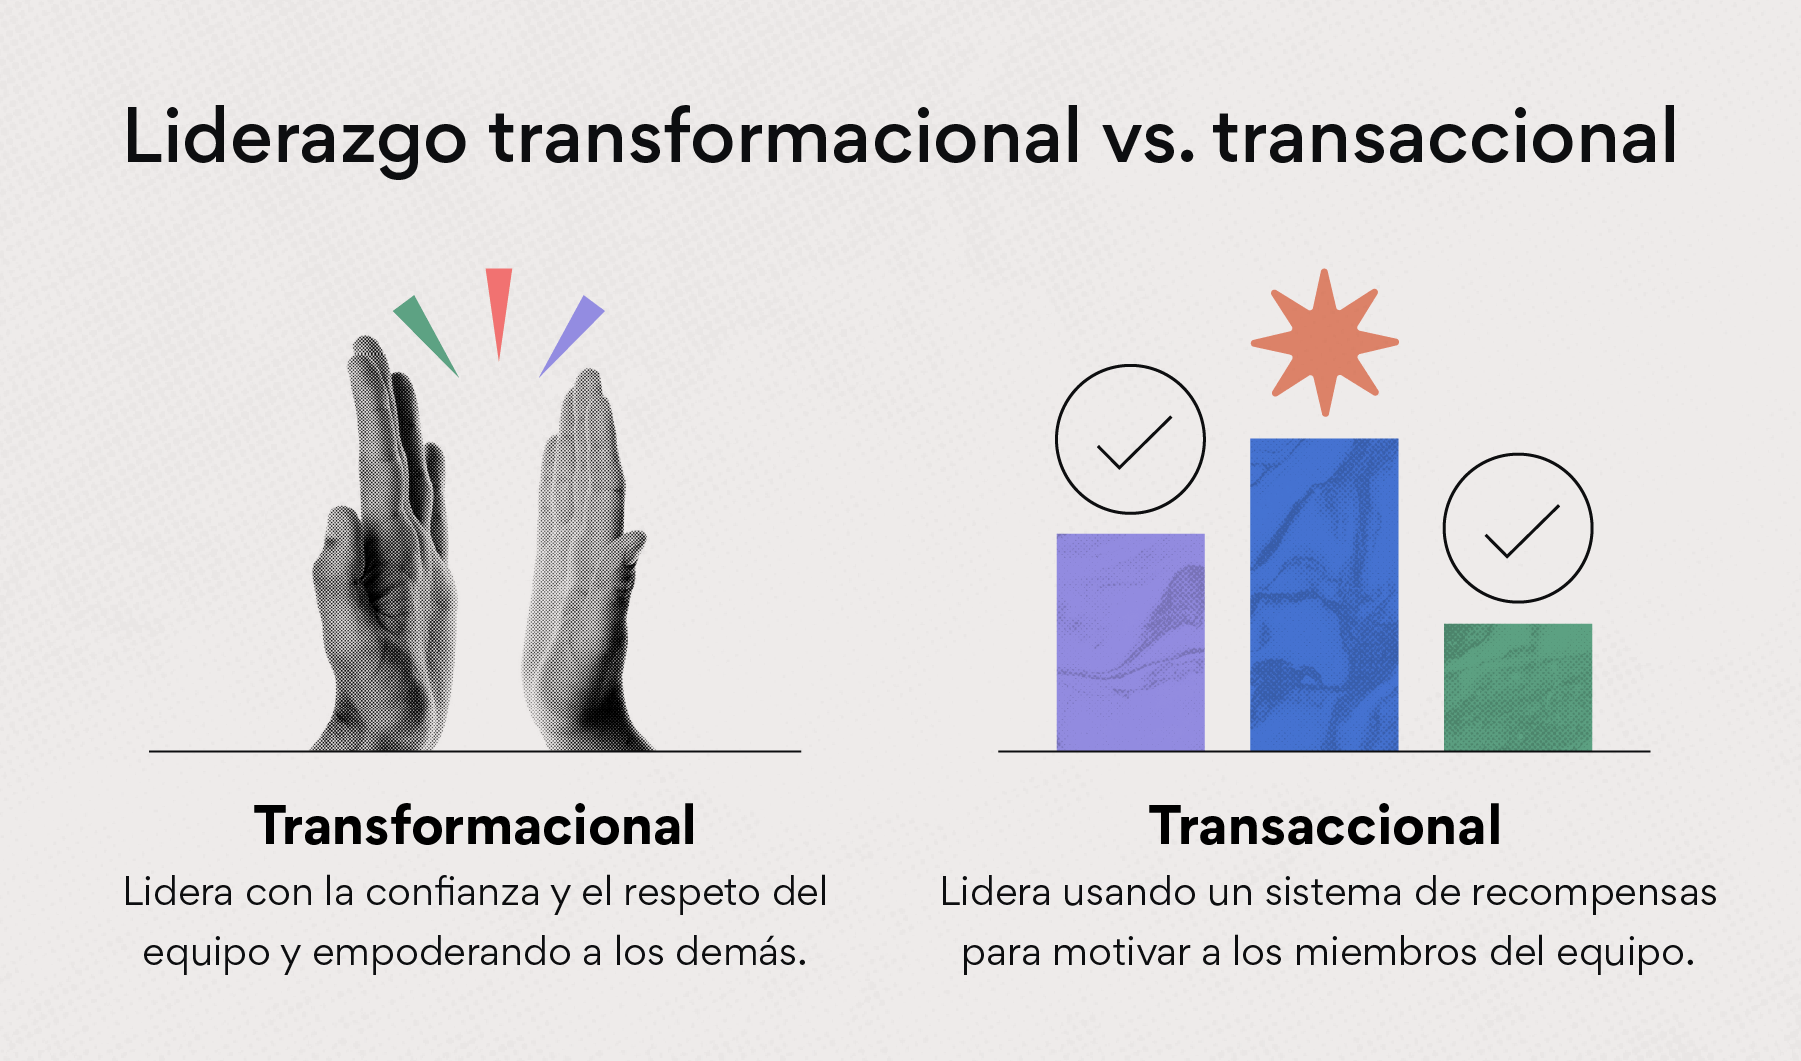 Liderazgo transformacional vs. transaccional